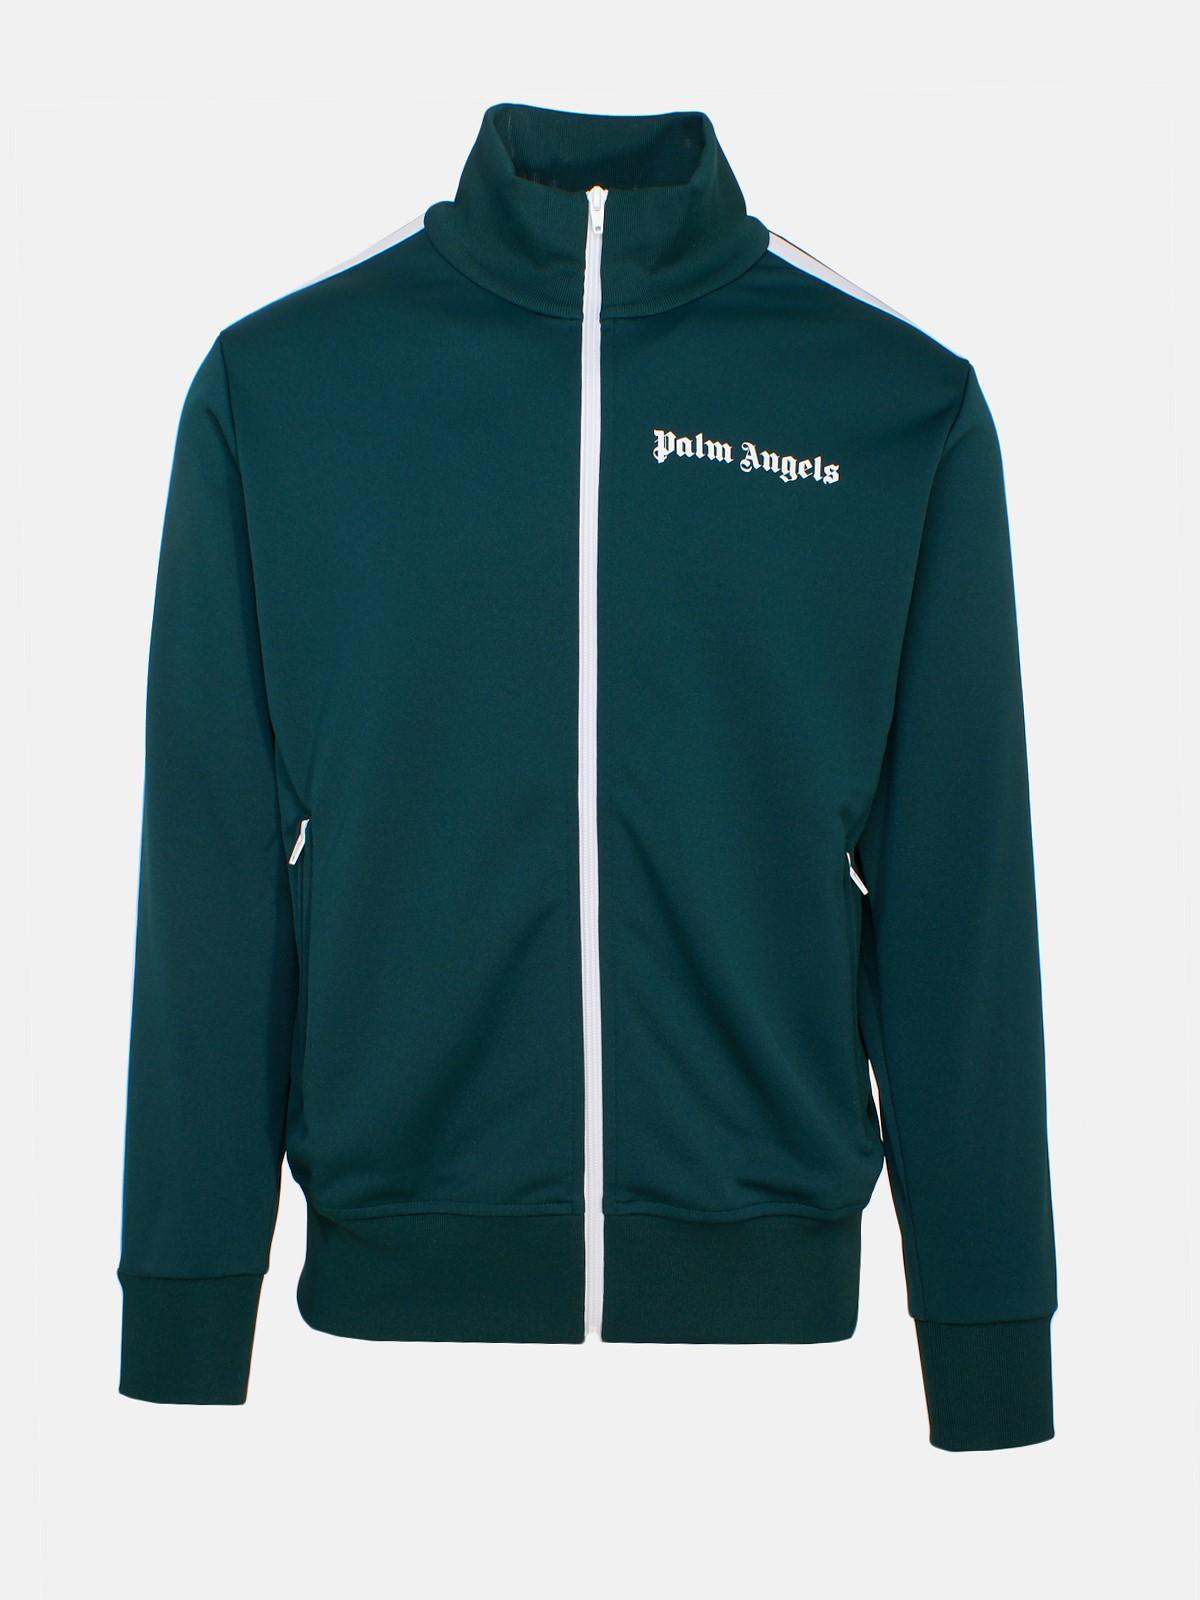 81b3d392f1e01 Palm Angels - Green Classic Track Jacket for Men - Lyst. View fullscreen